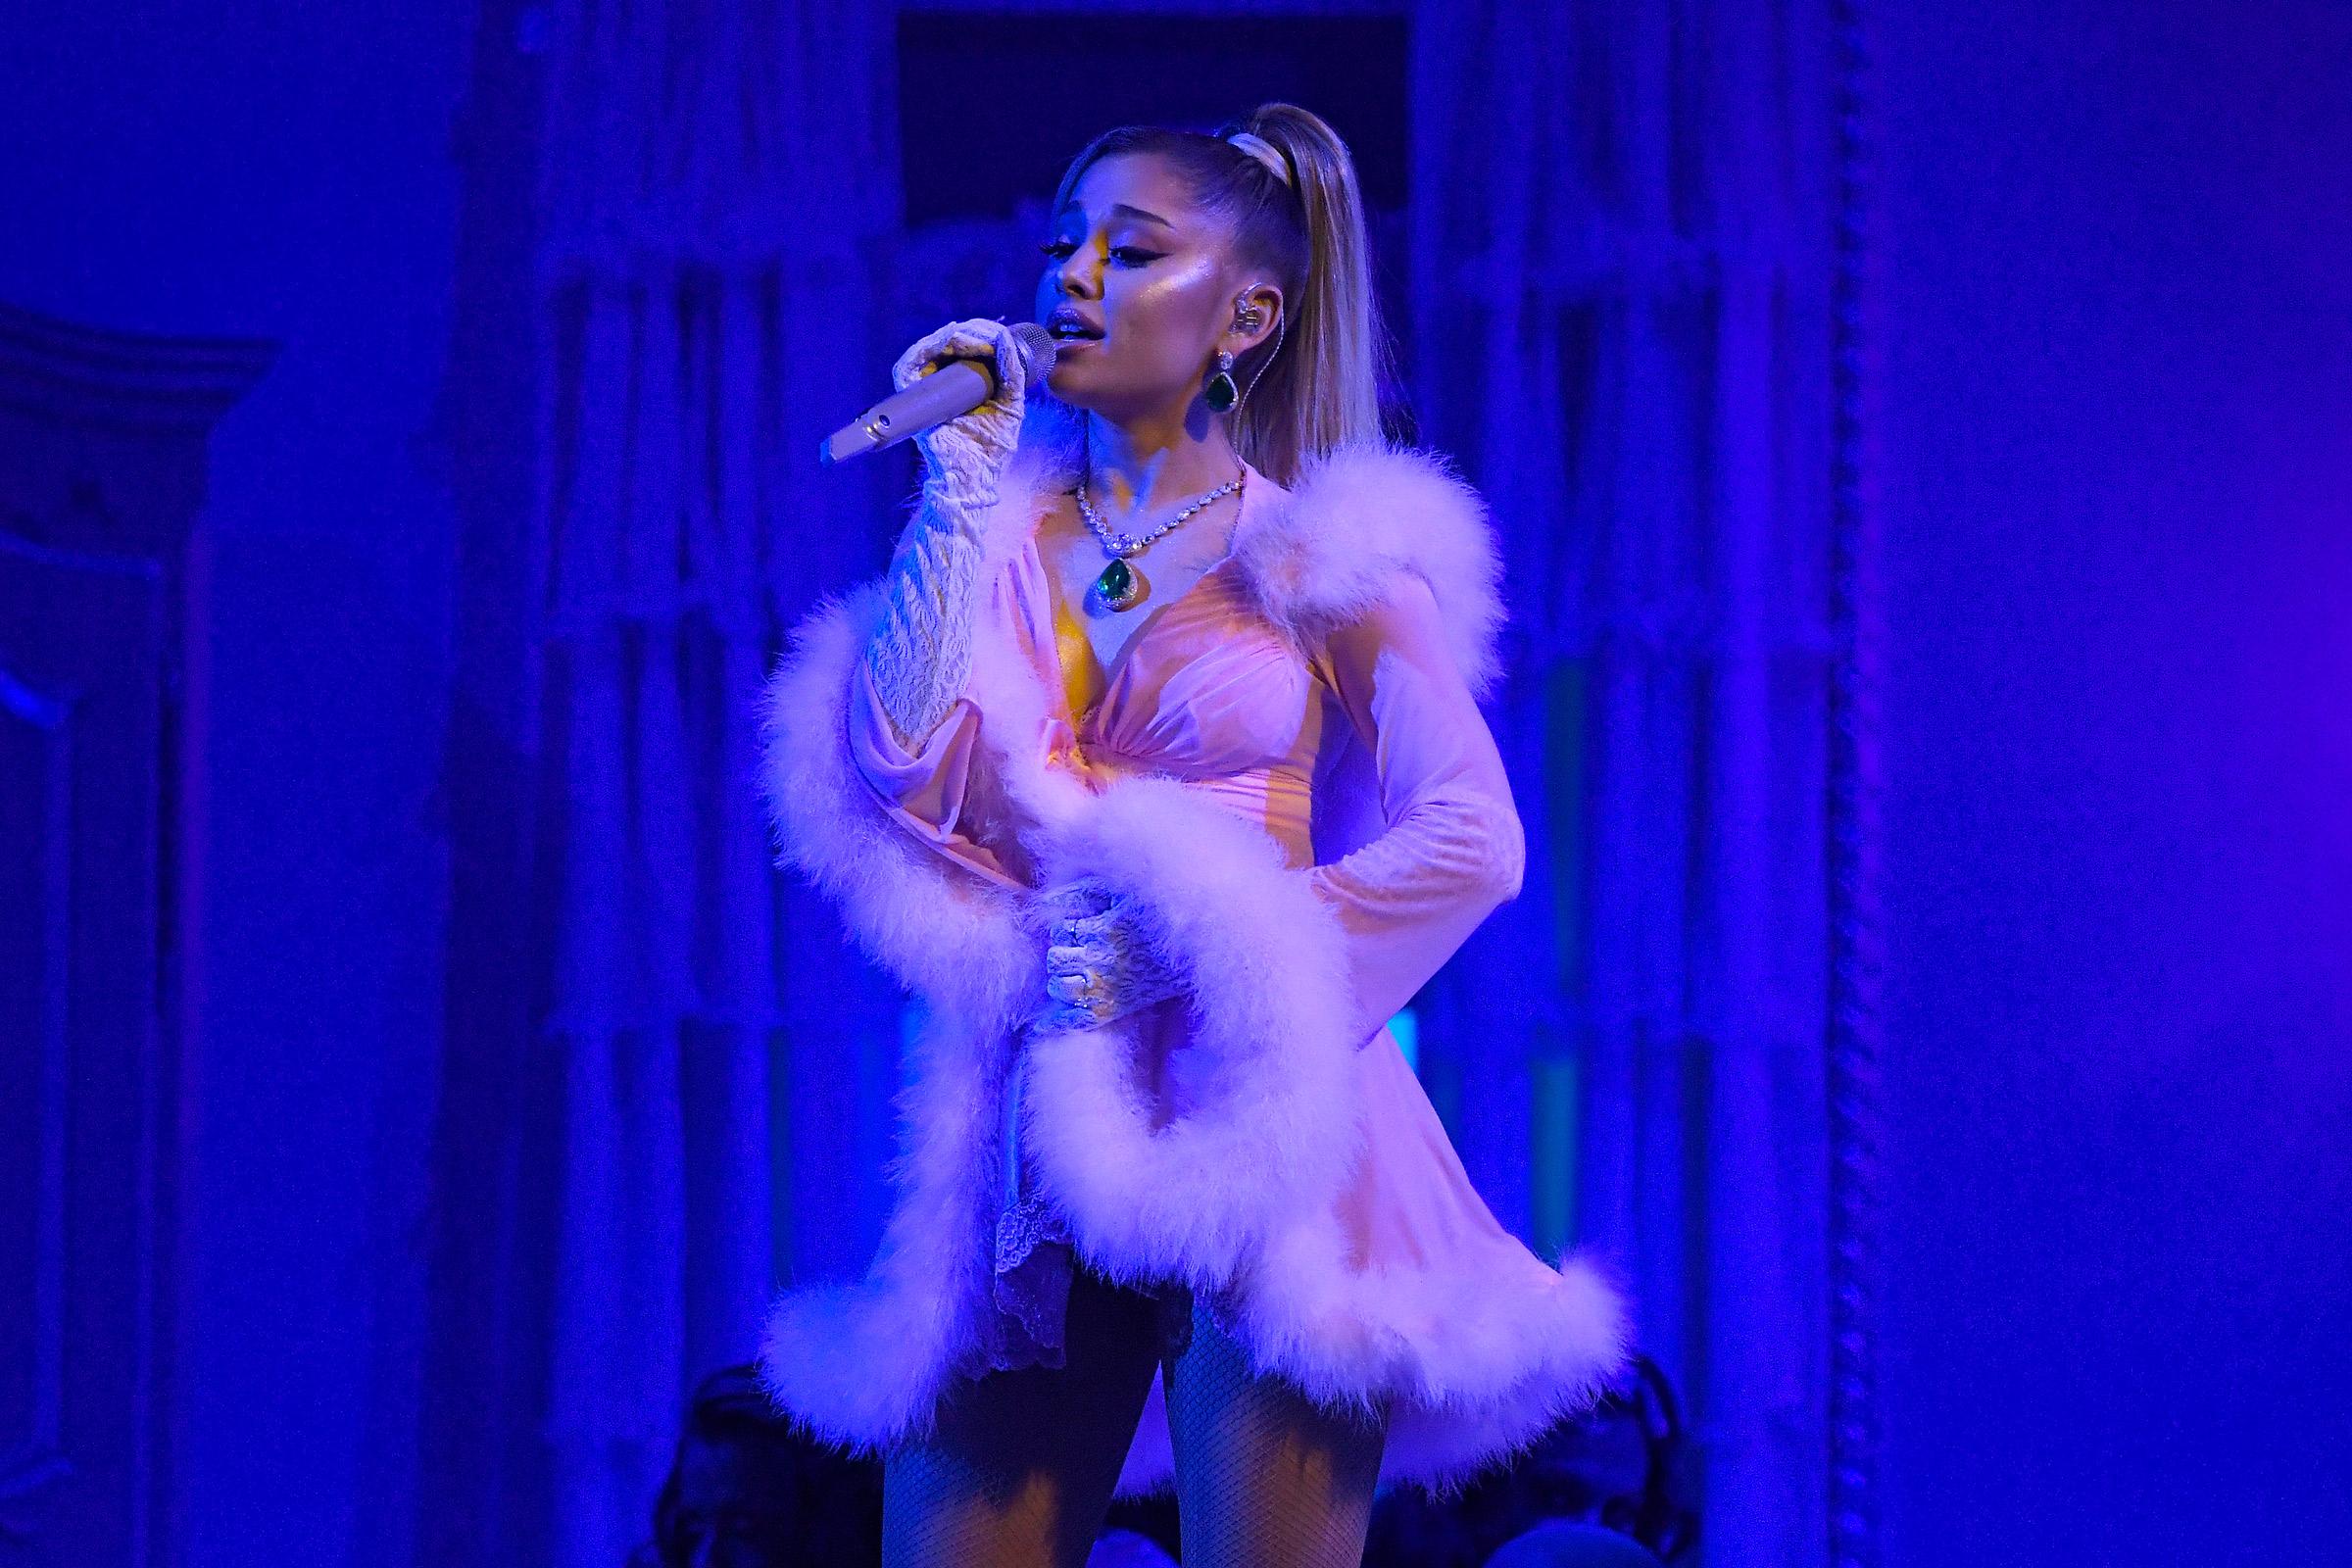 ariana grande performs thank u next album medley at 2020 grammys rolling stone ariana grande performs thank u next album medley at 2020 grammys rolling stone